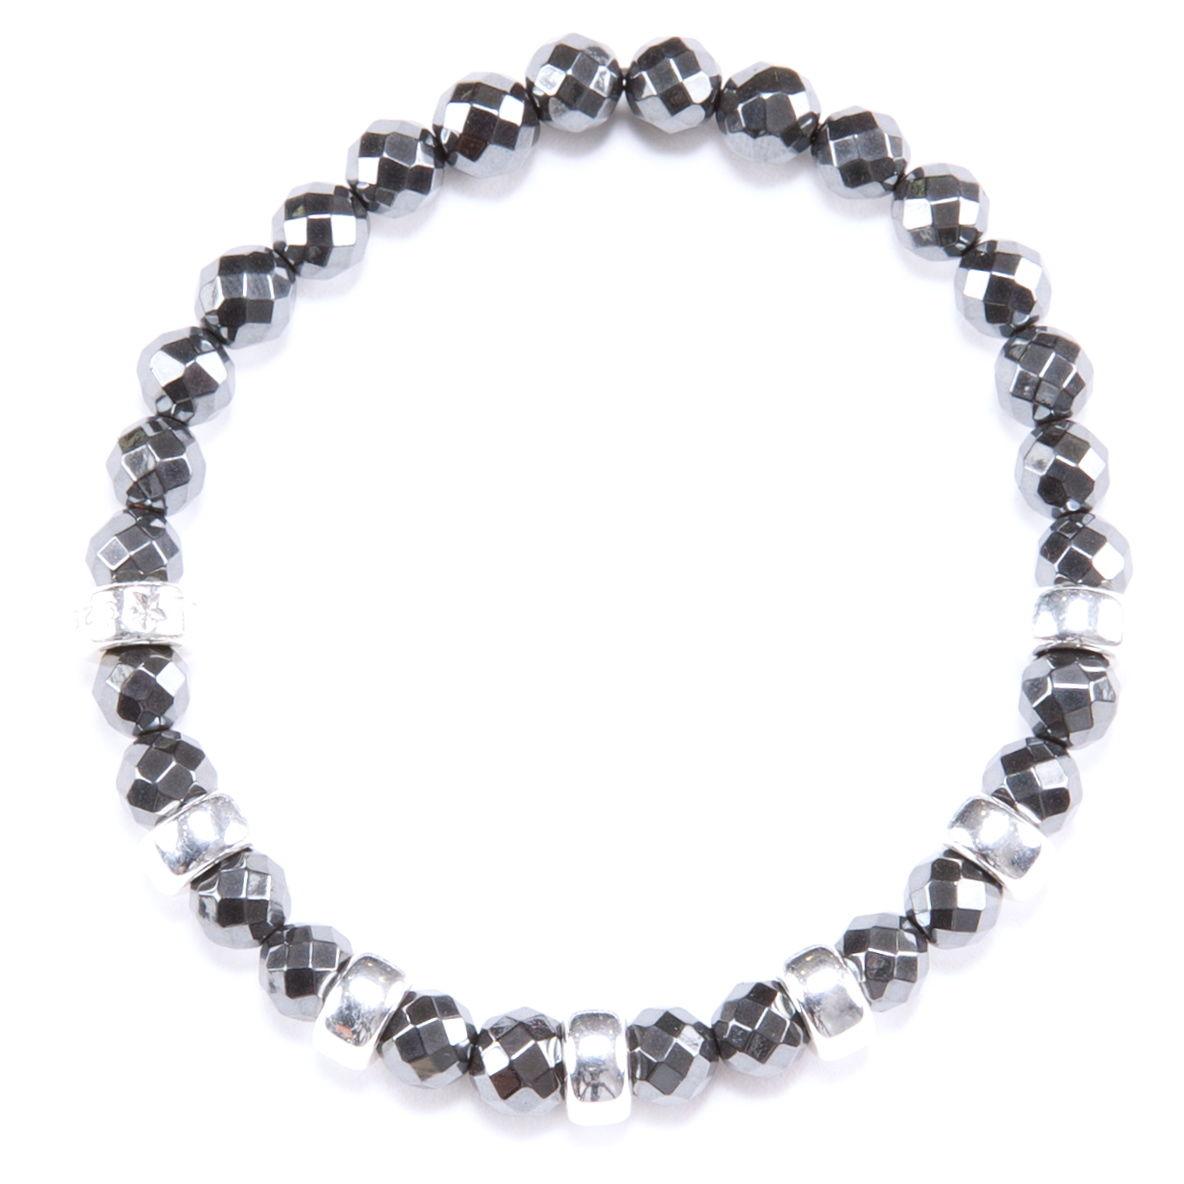 Hematite & Silver beads Bracelet